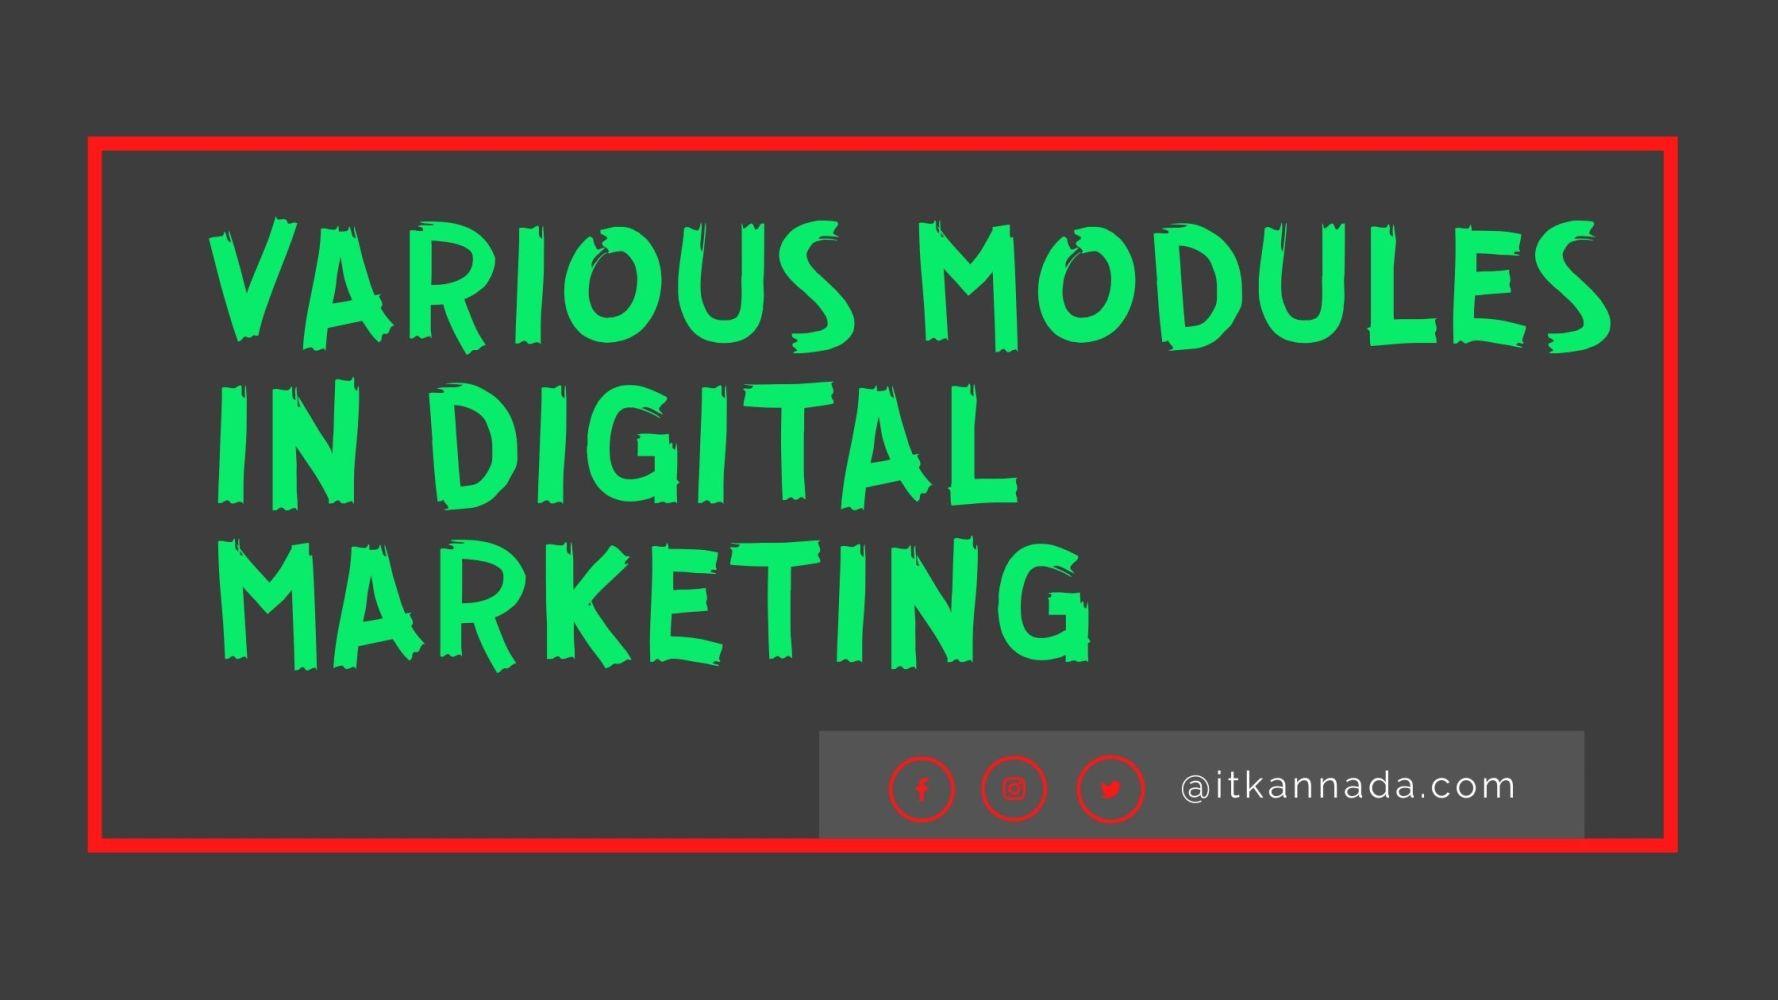 various modules in Digital Marketing